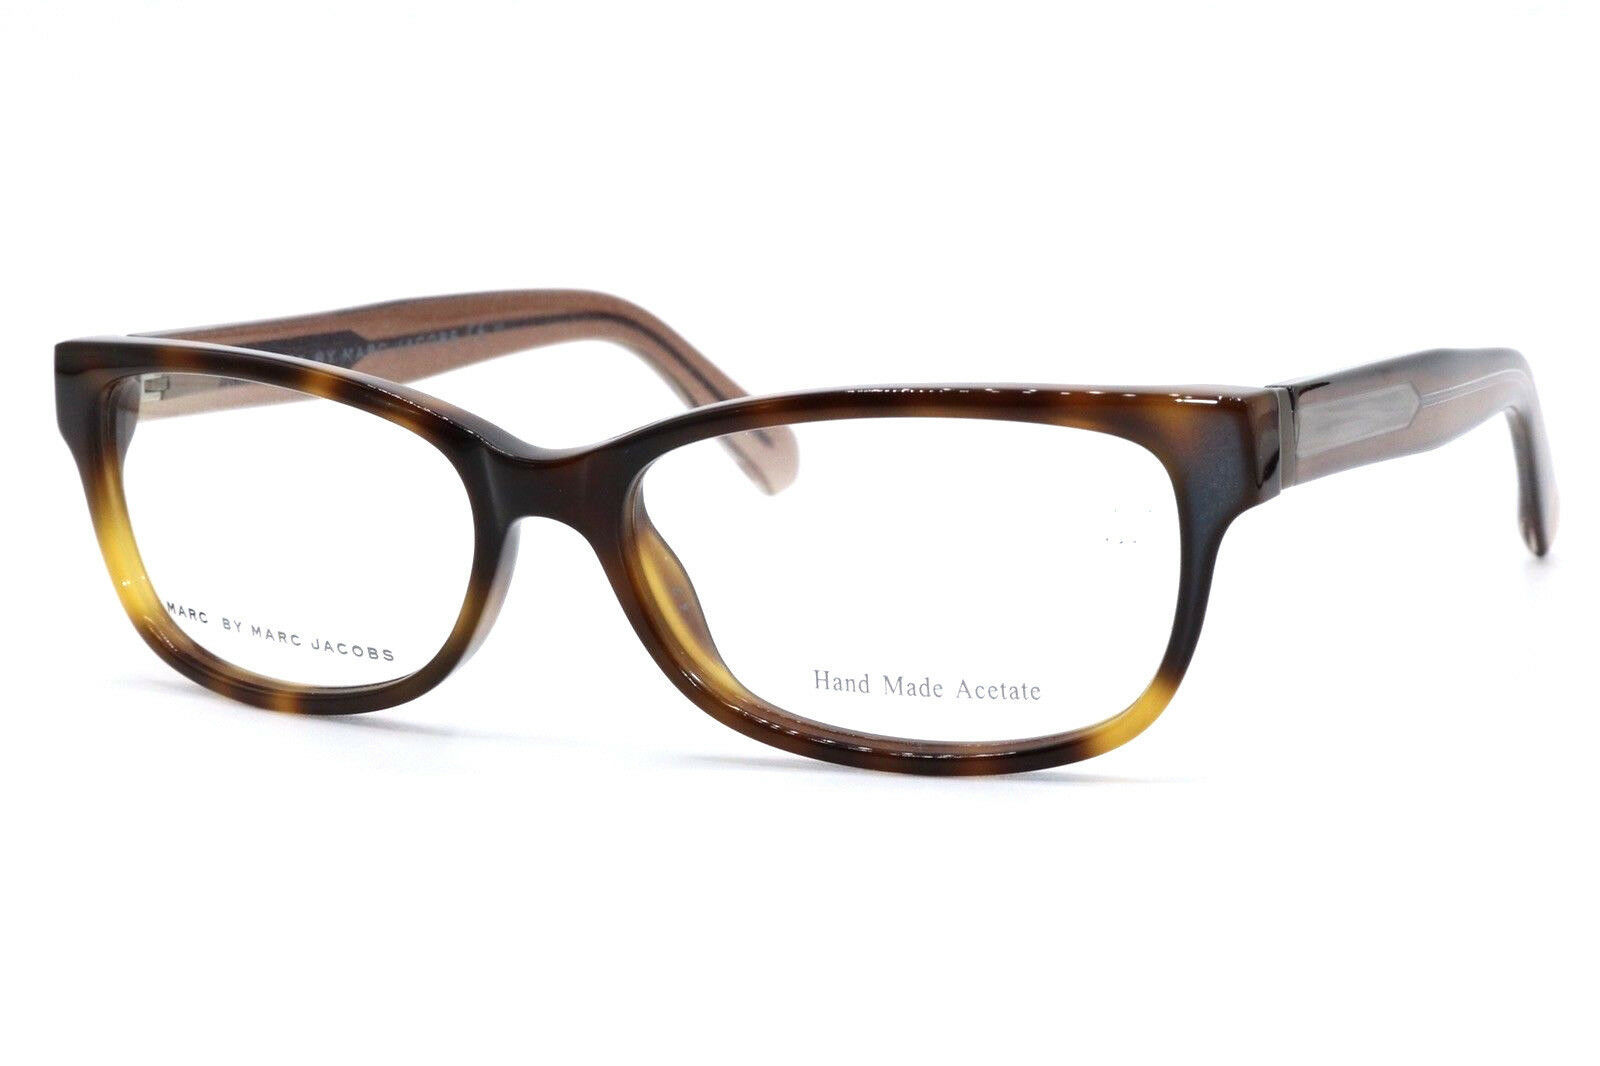 New Authentic Marc by Marc Jacobs 598 5XZ Havana Eyeglasses 52-15-140 W/Case - $48.51